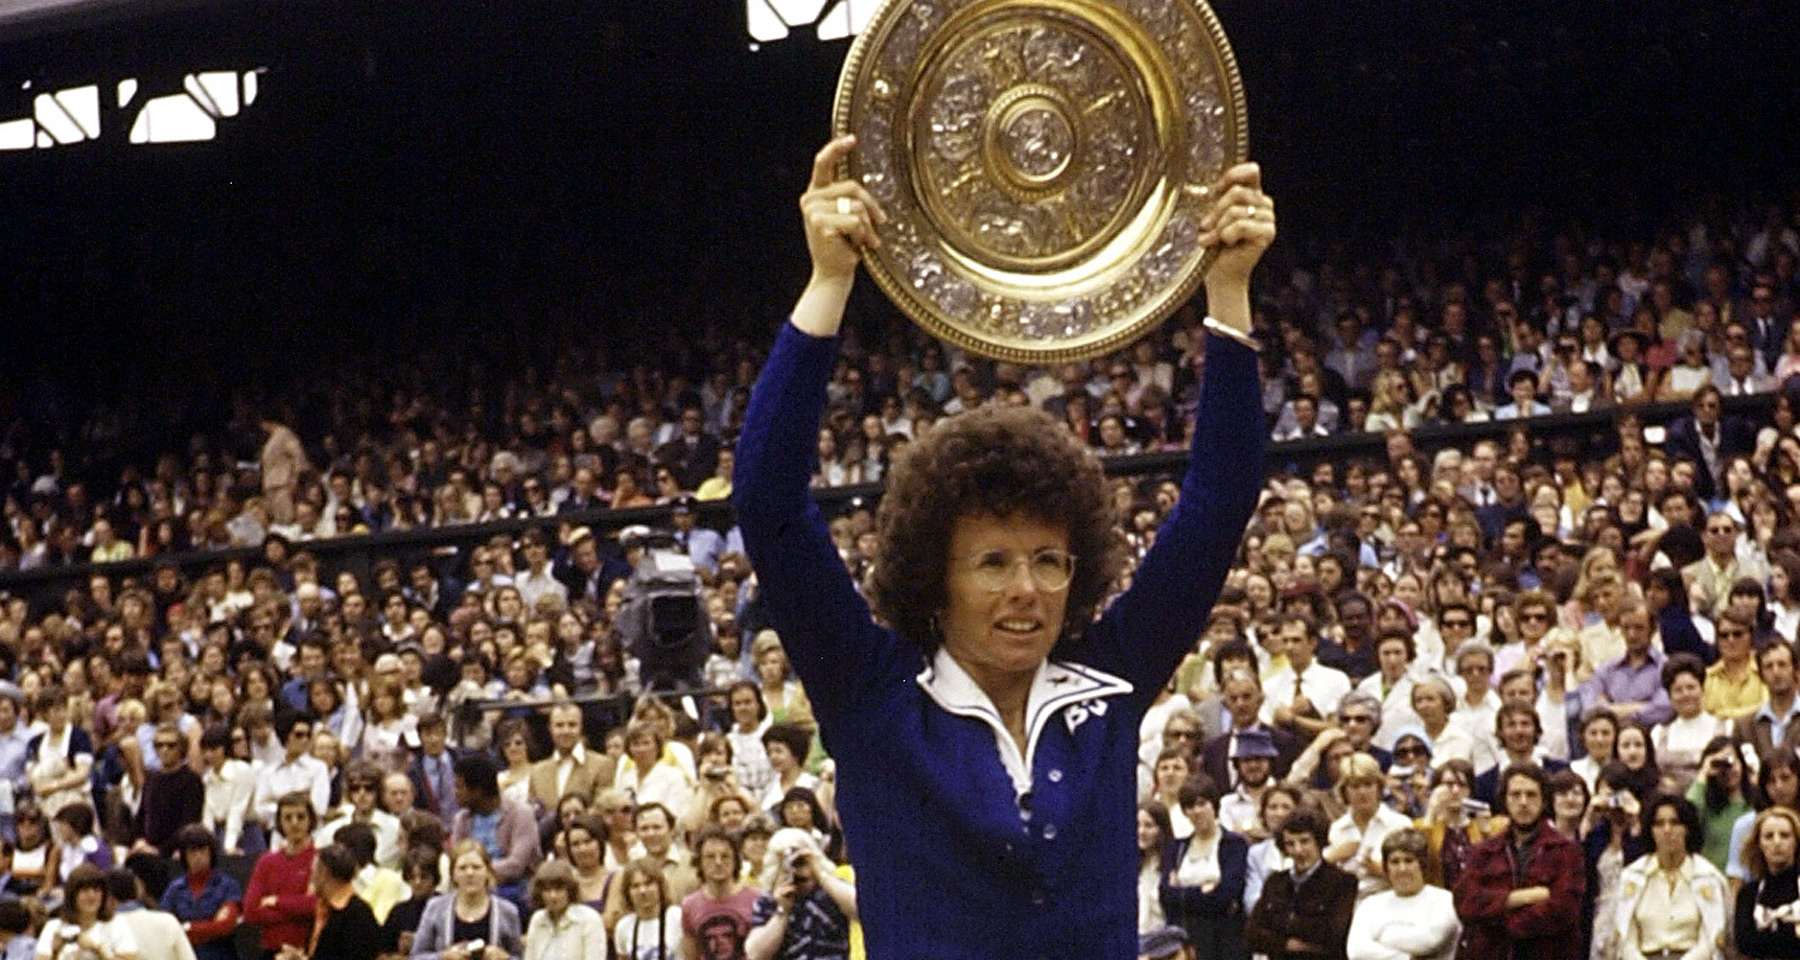 images Billie Jean King 12 Grand Slam singles titles